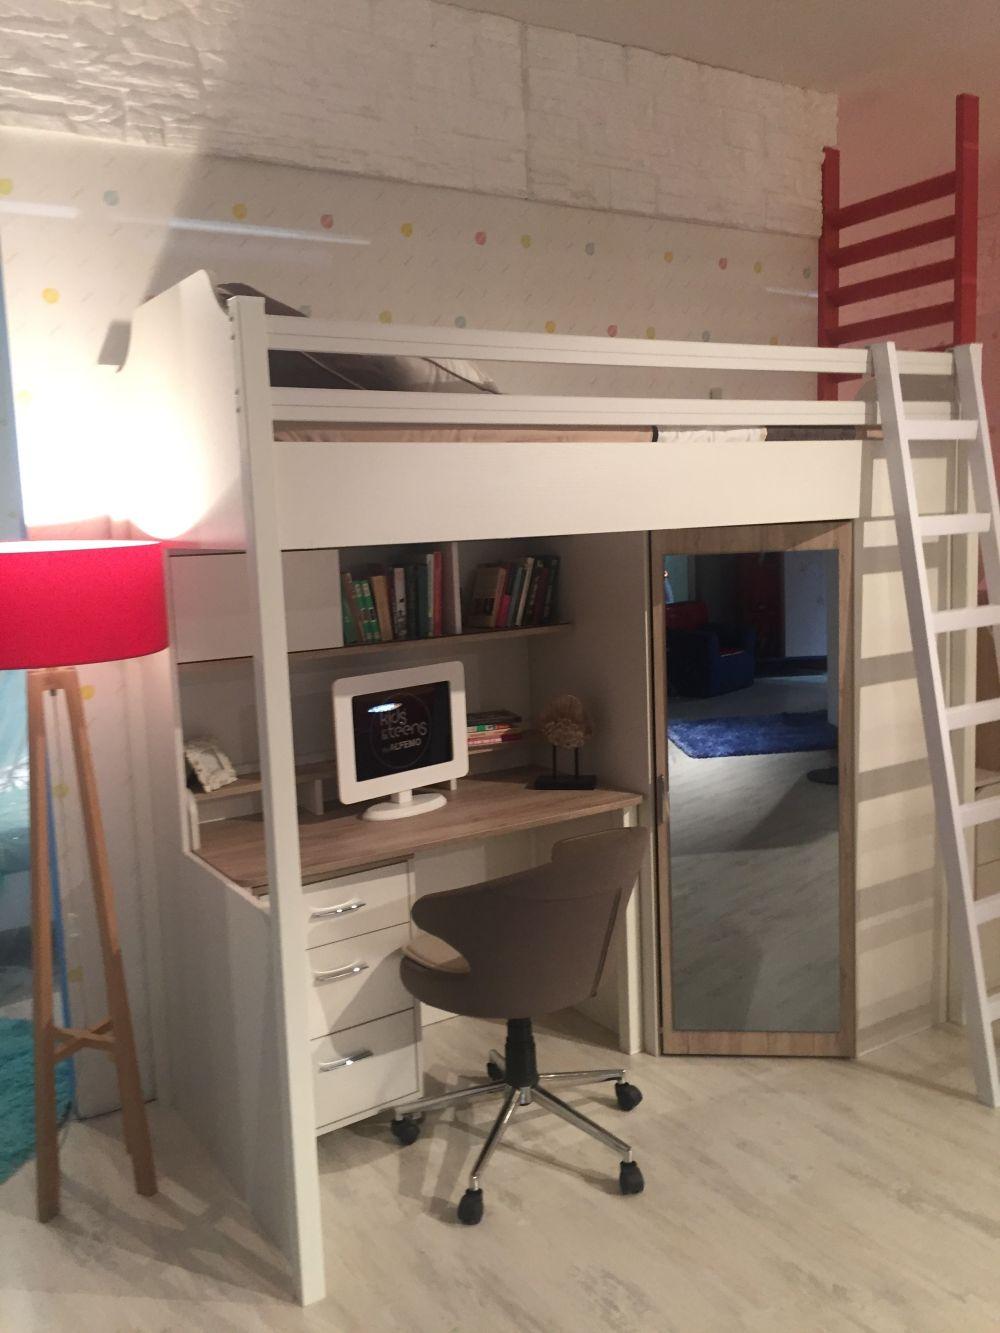 Study Hall Bed - kids room